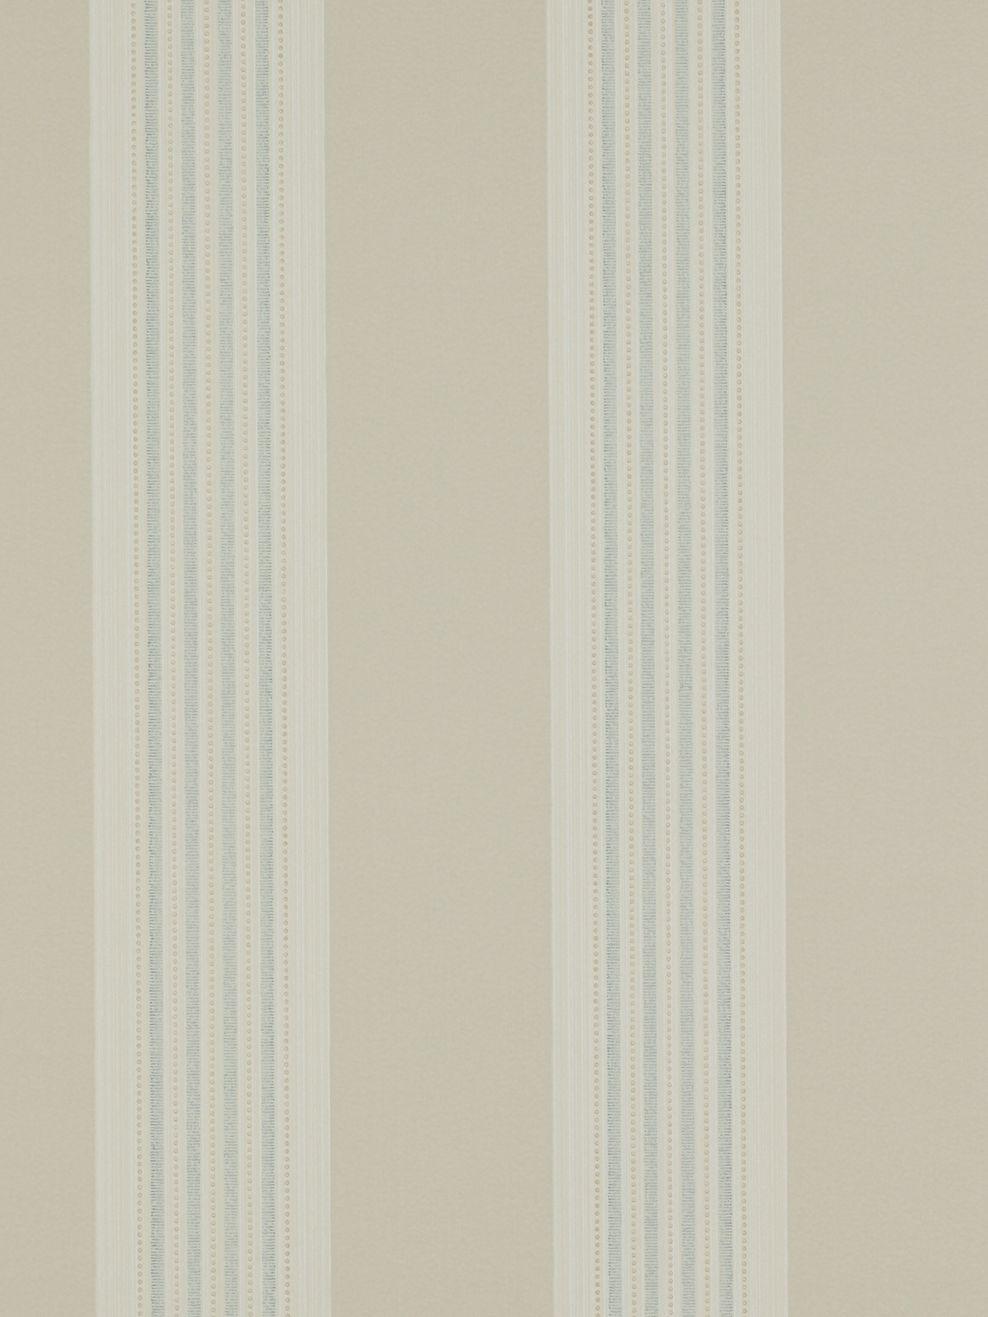 Colefax & Fowler Colefax & Fowler Tealby Stripe Wallpaper